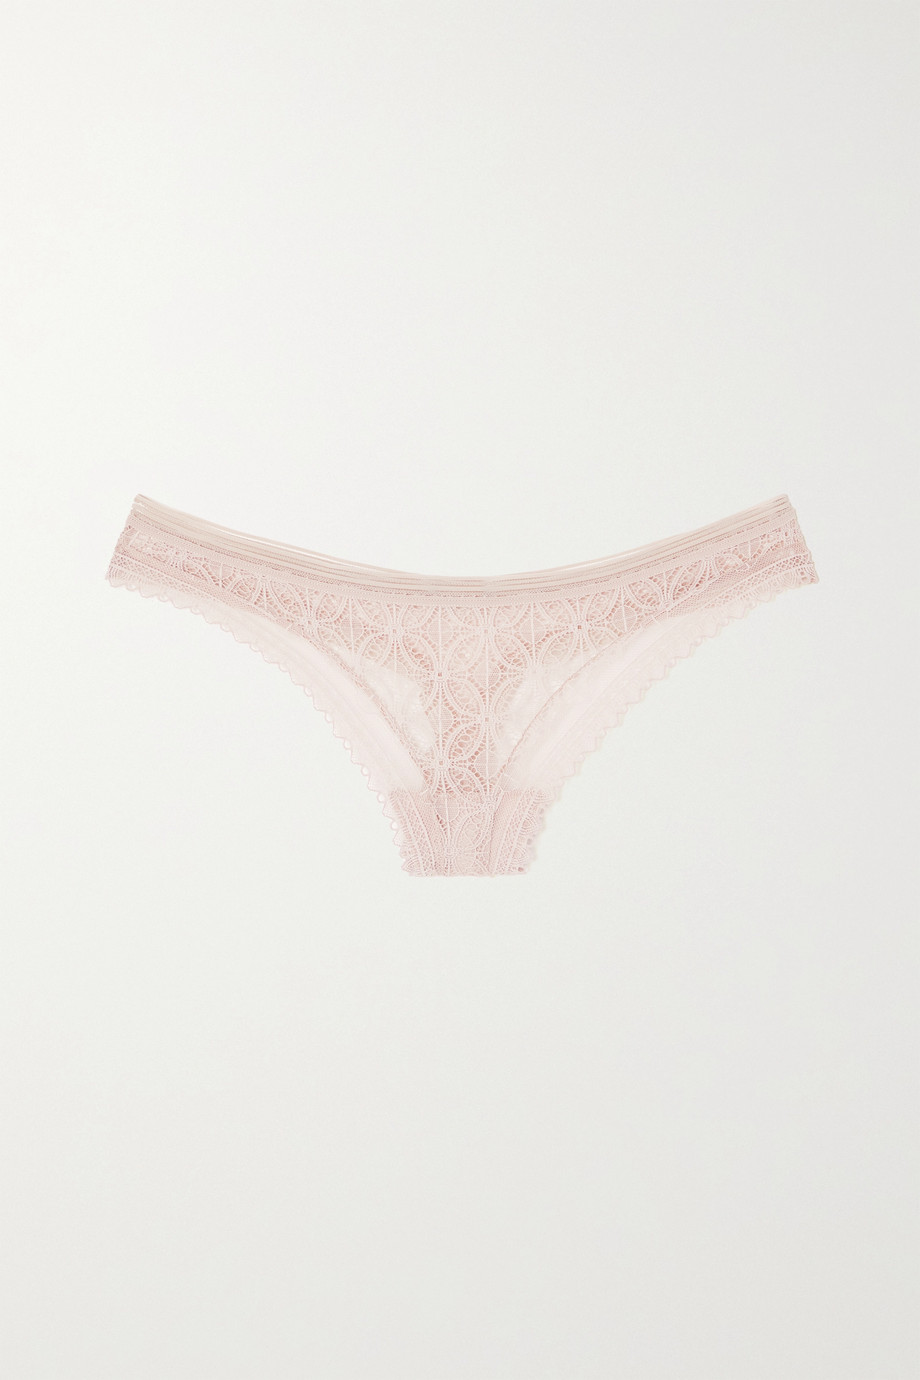 ELSE Chloe stretch-lace thong